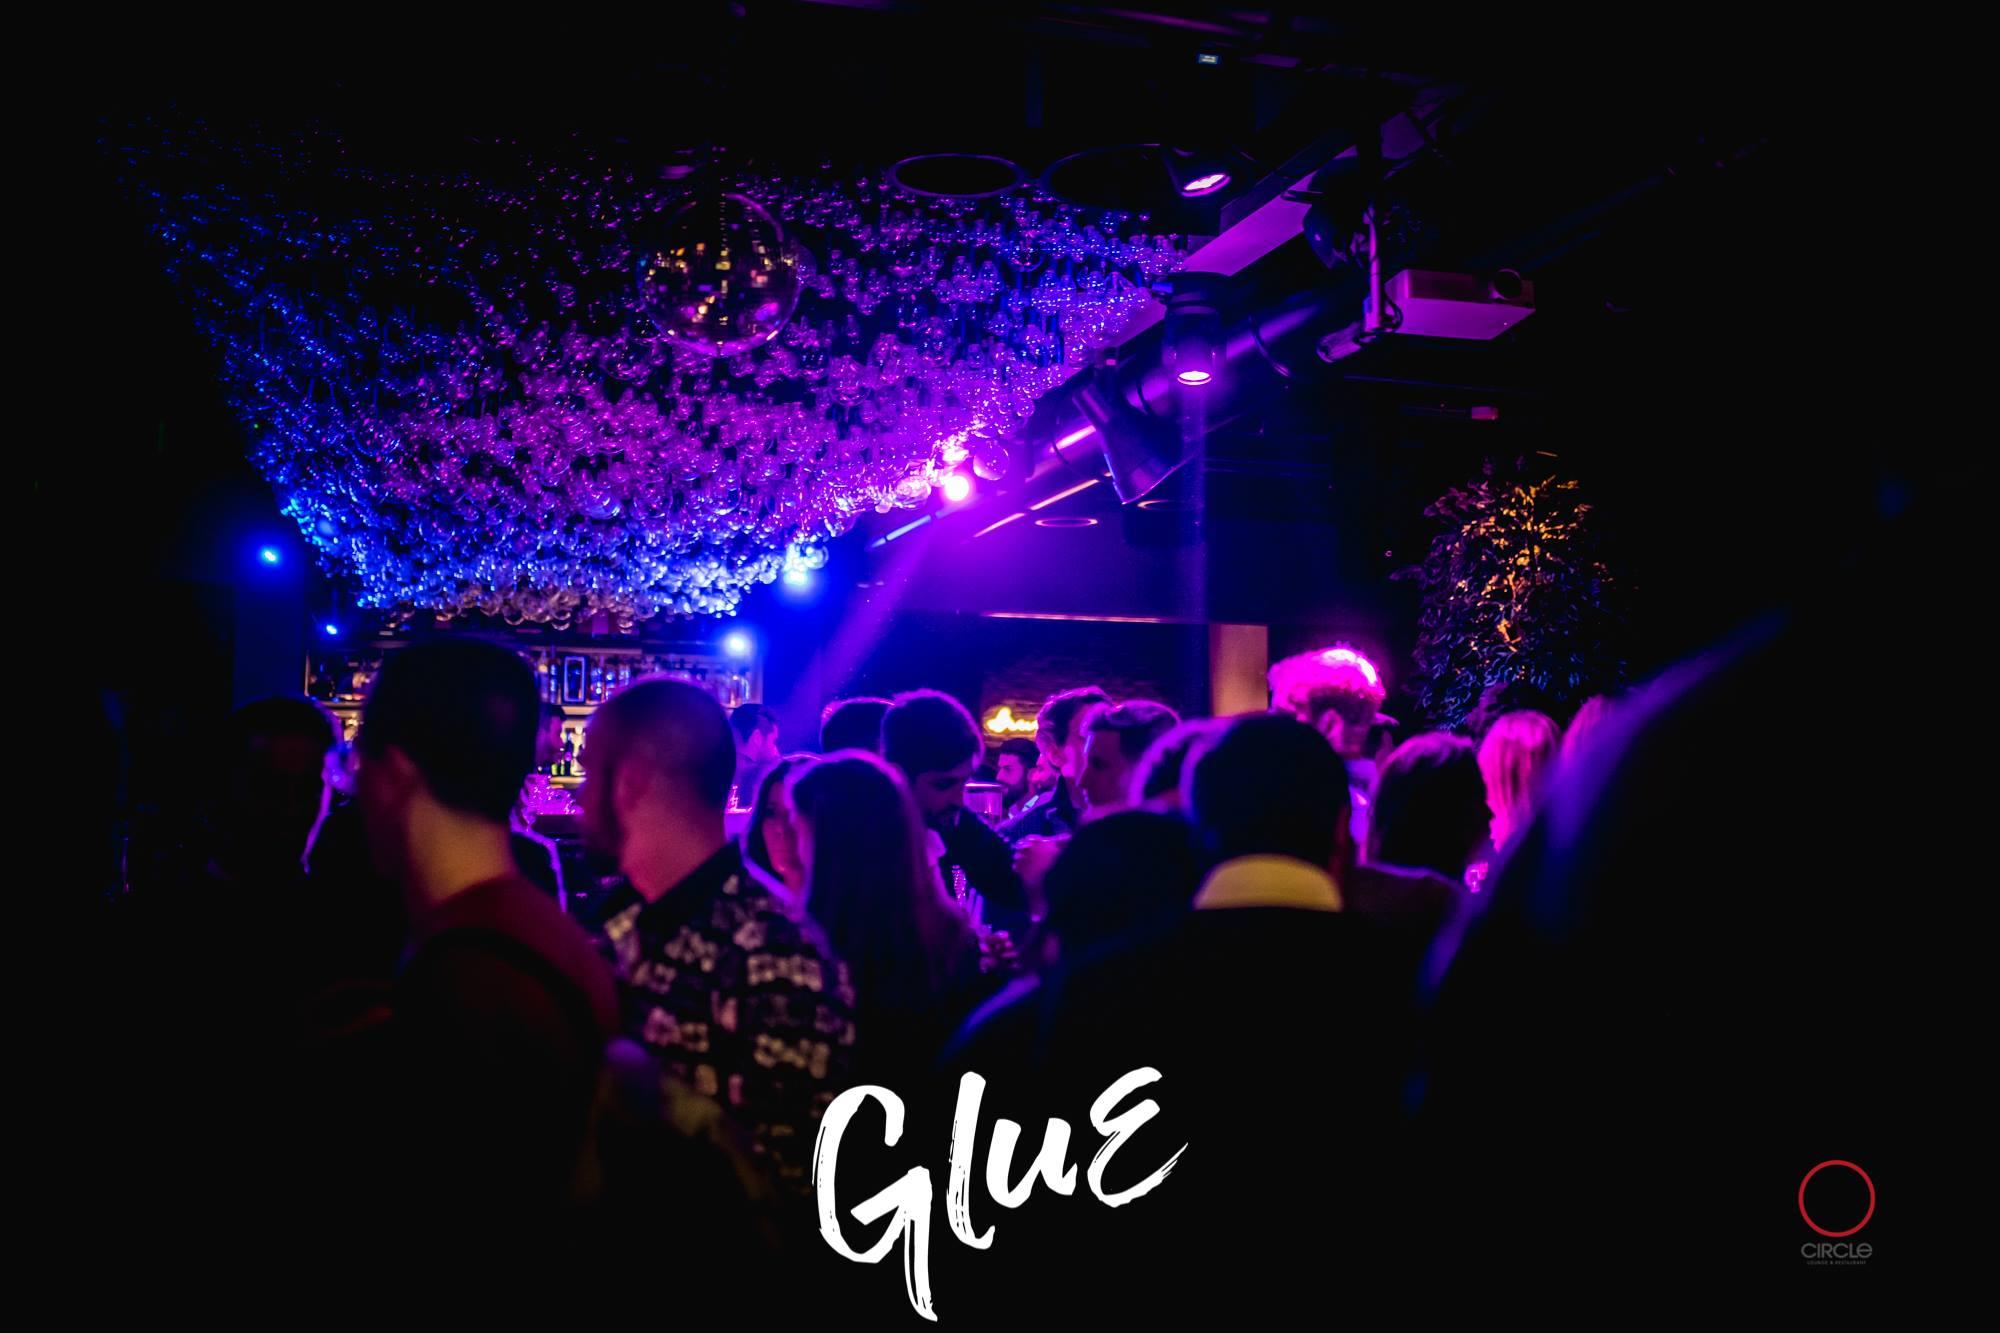 GLUE / Bee 2 Vee | YOUparti circle milano friday free club dj